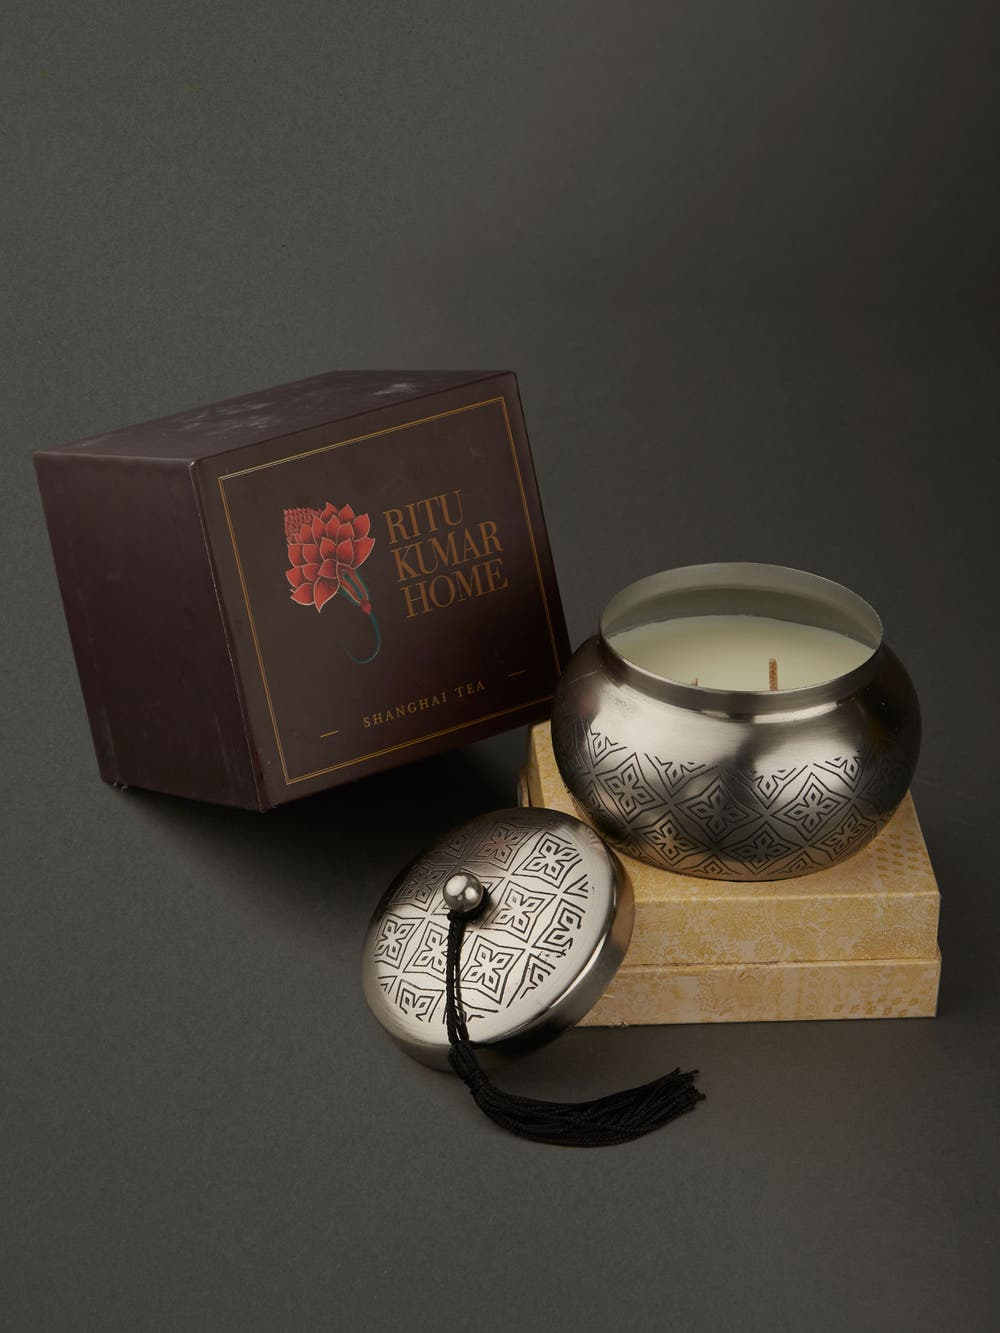 Shangai Tea Brass Lid Votive